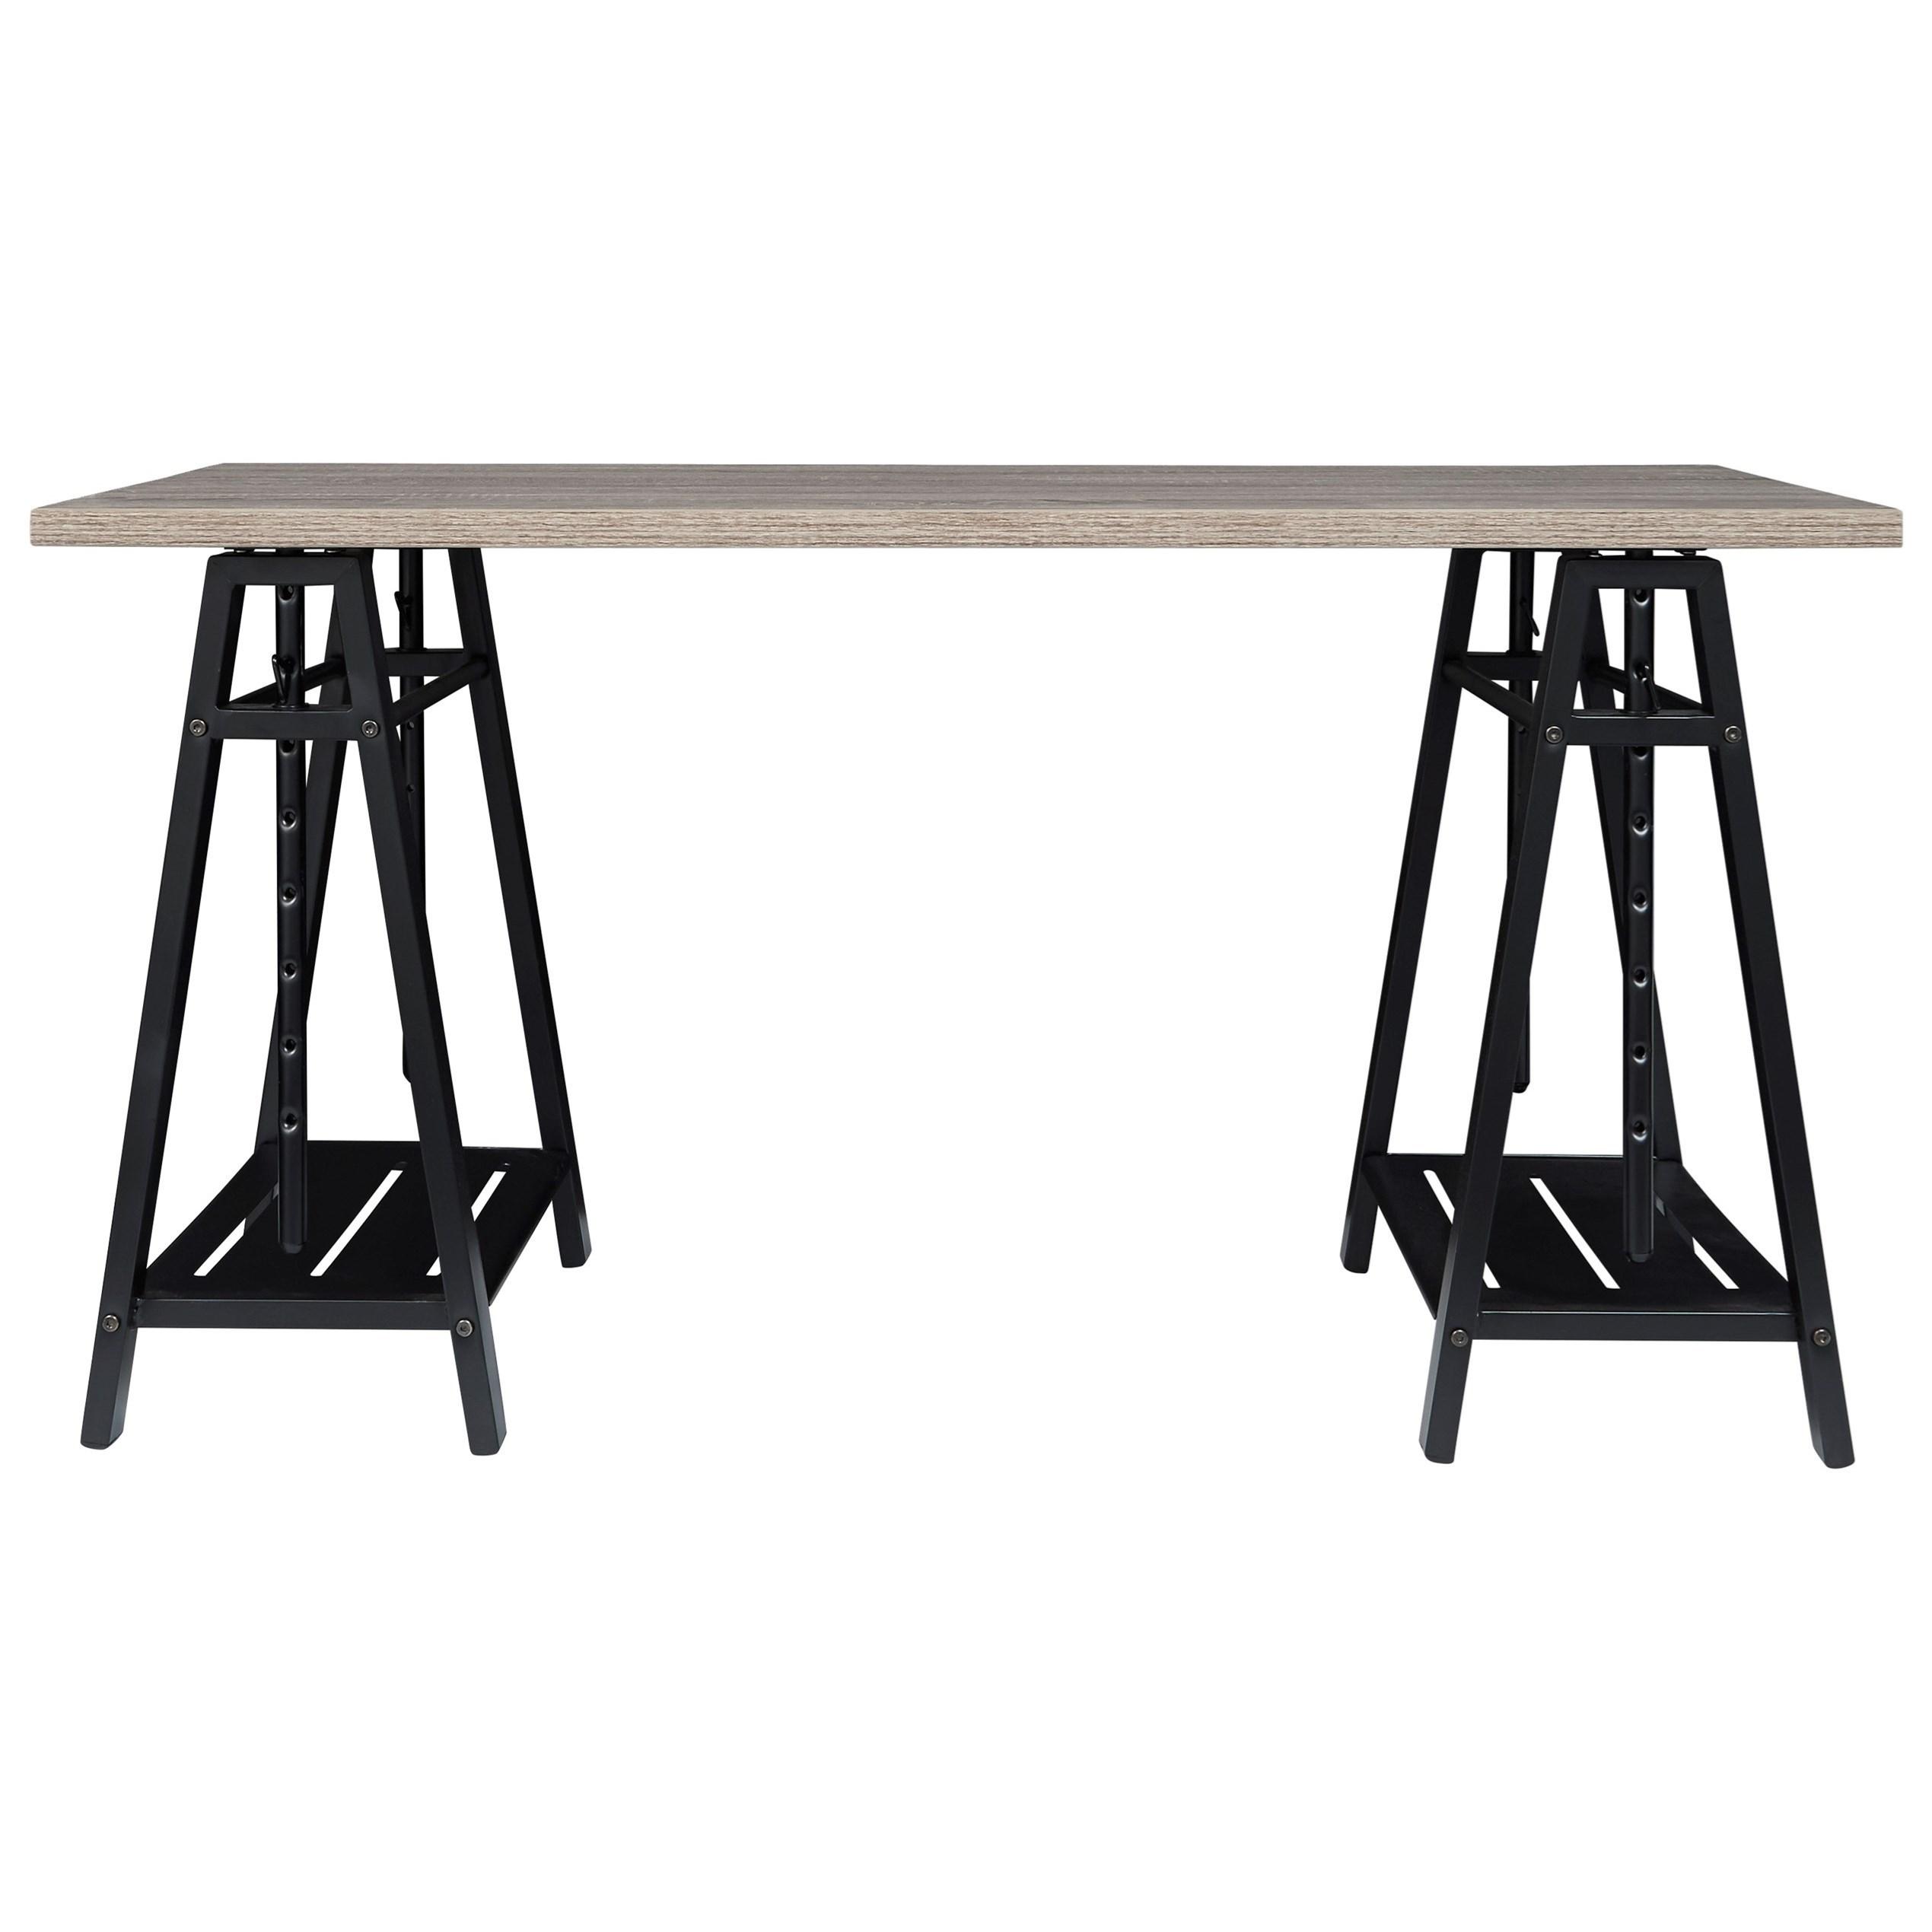 Irene Adjustable Height Desk by Ashley (Signature Design) at Johnny Janosik